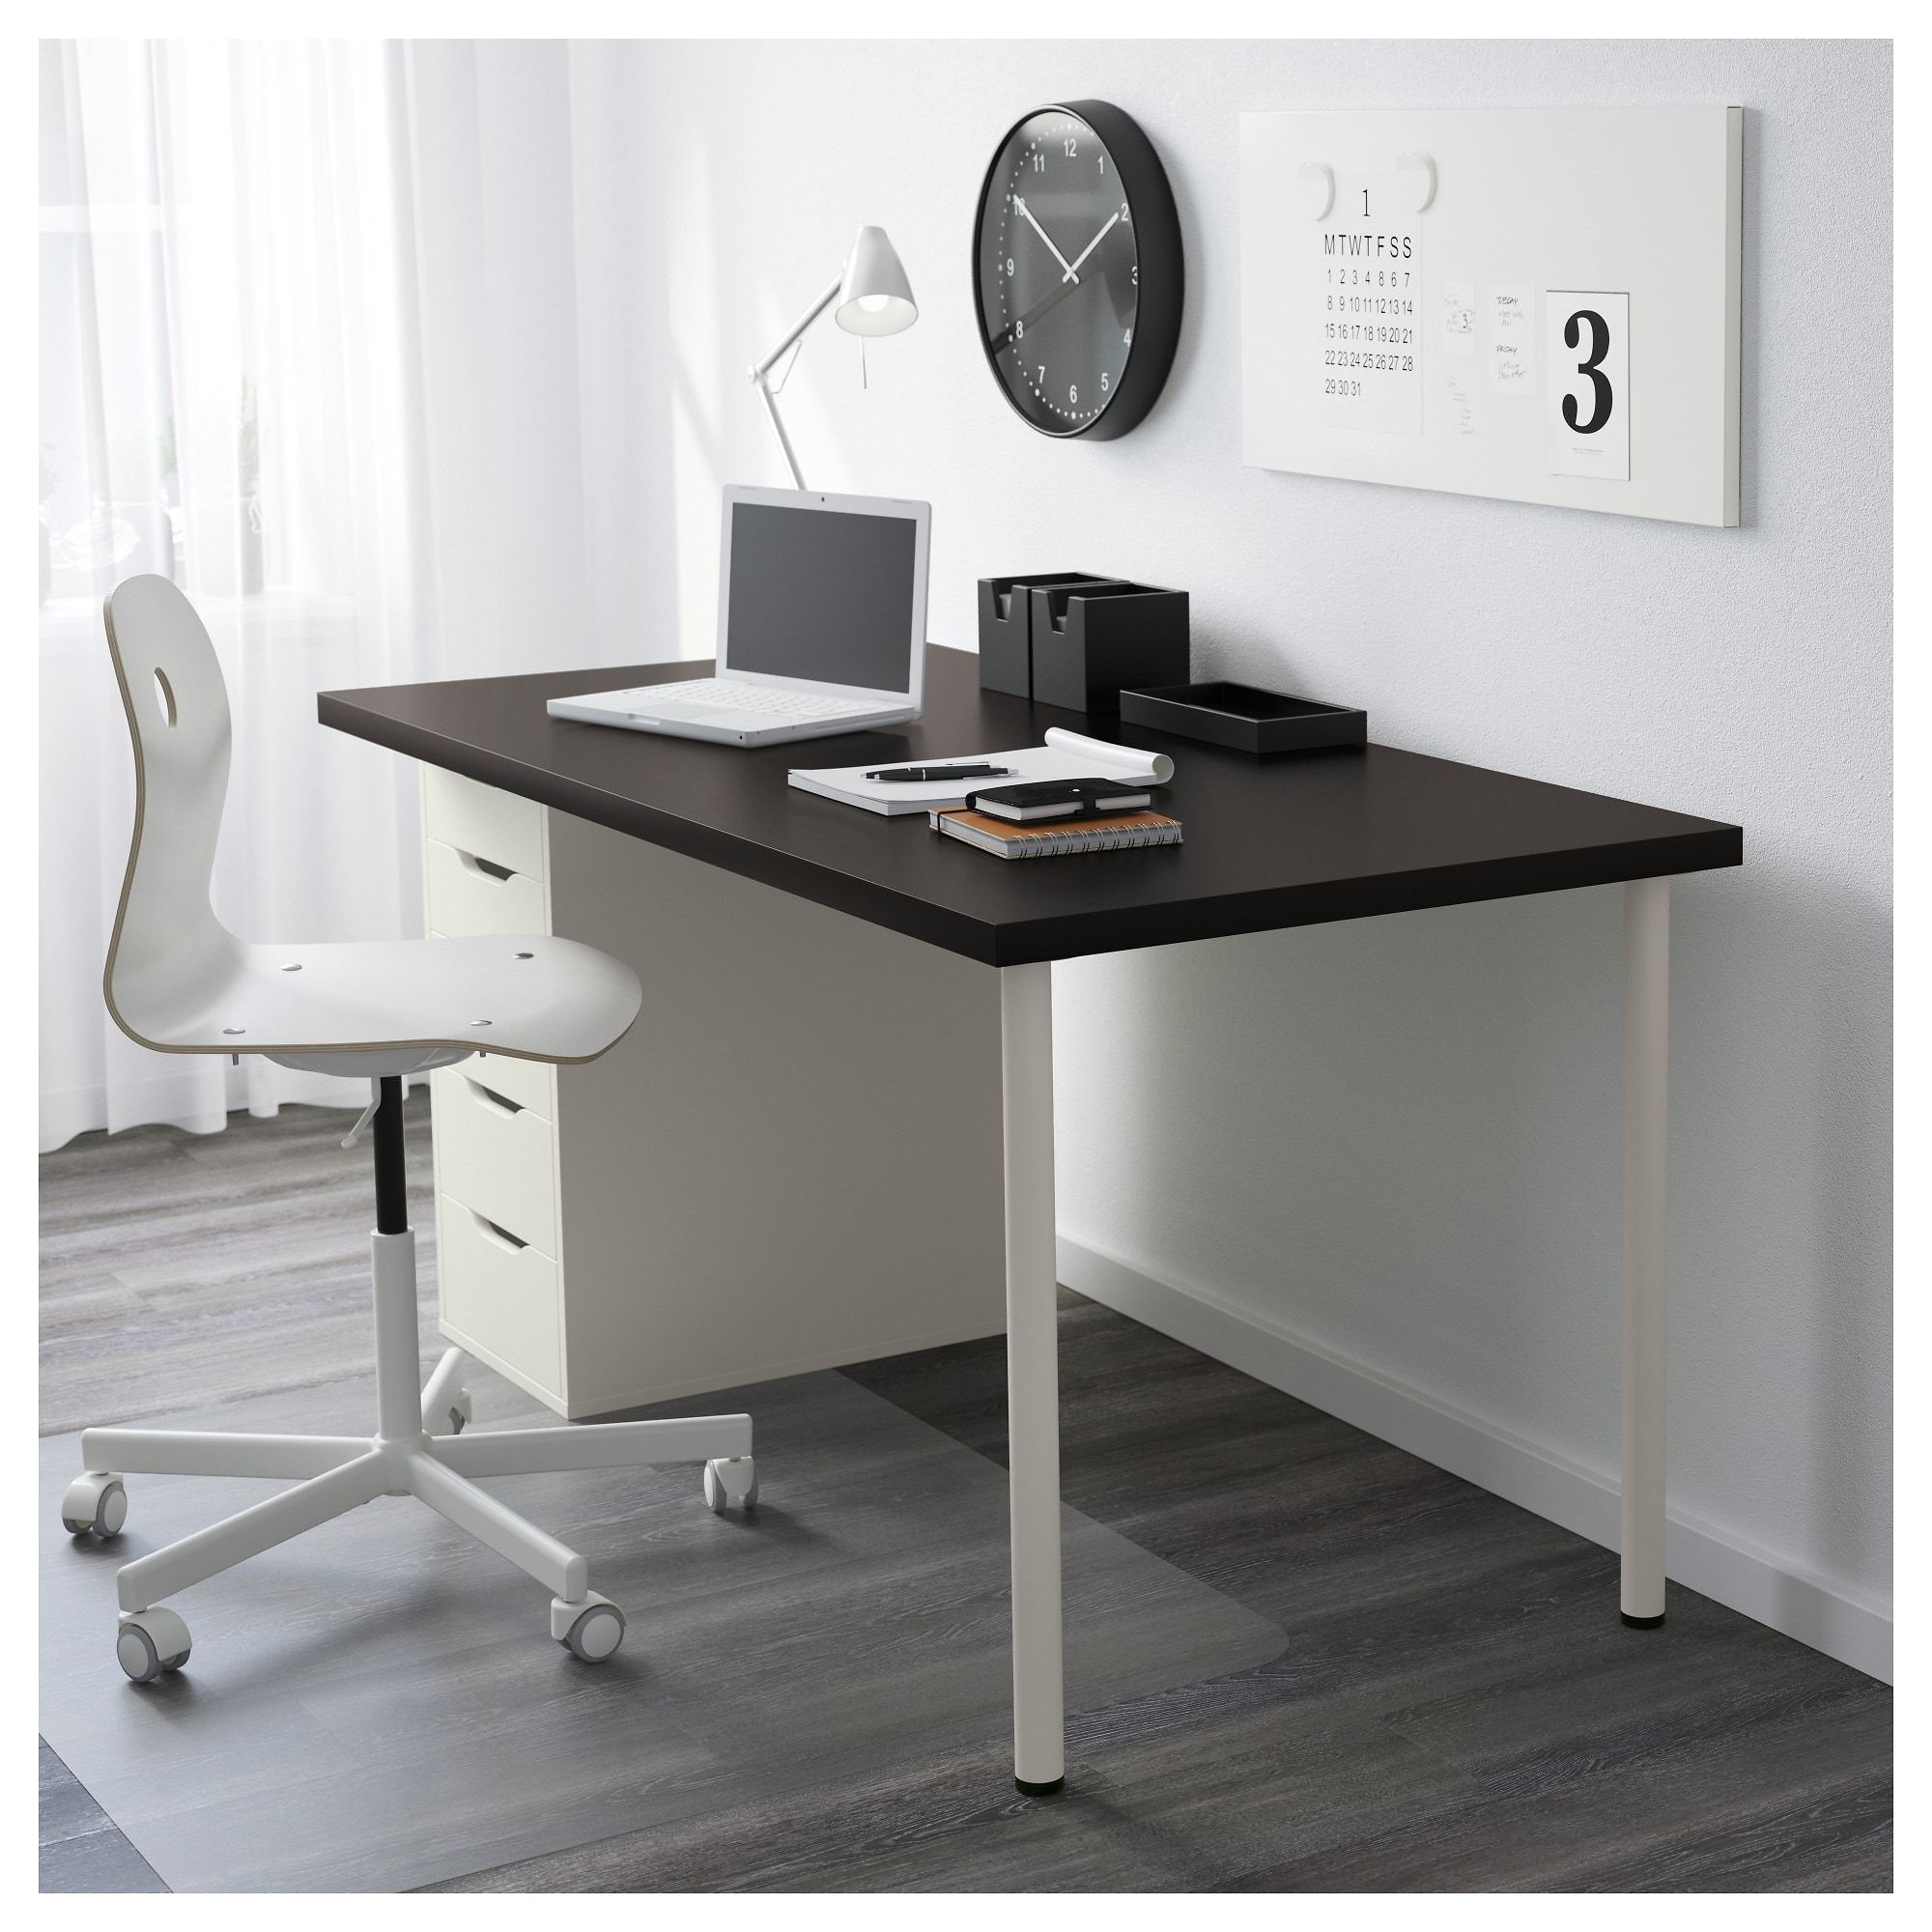 Linnmon Alex Table Black Brown White 59x29 1 2 Ikea Cheap Office Furniture Drawer Unit Ikea